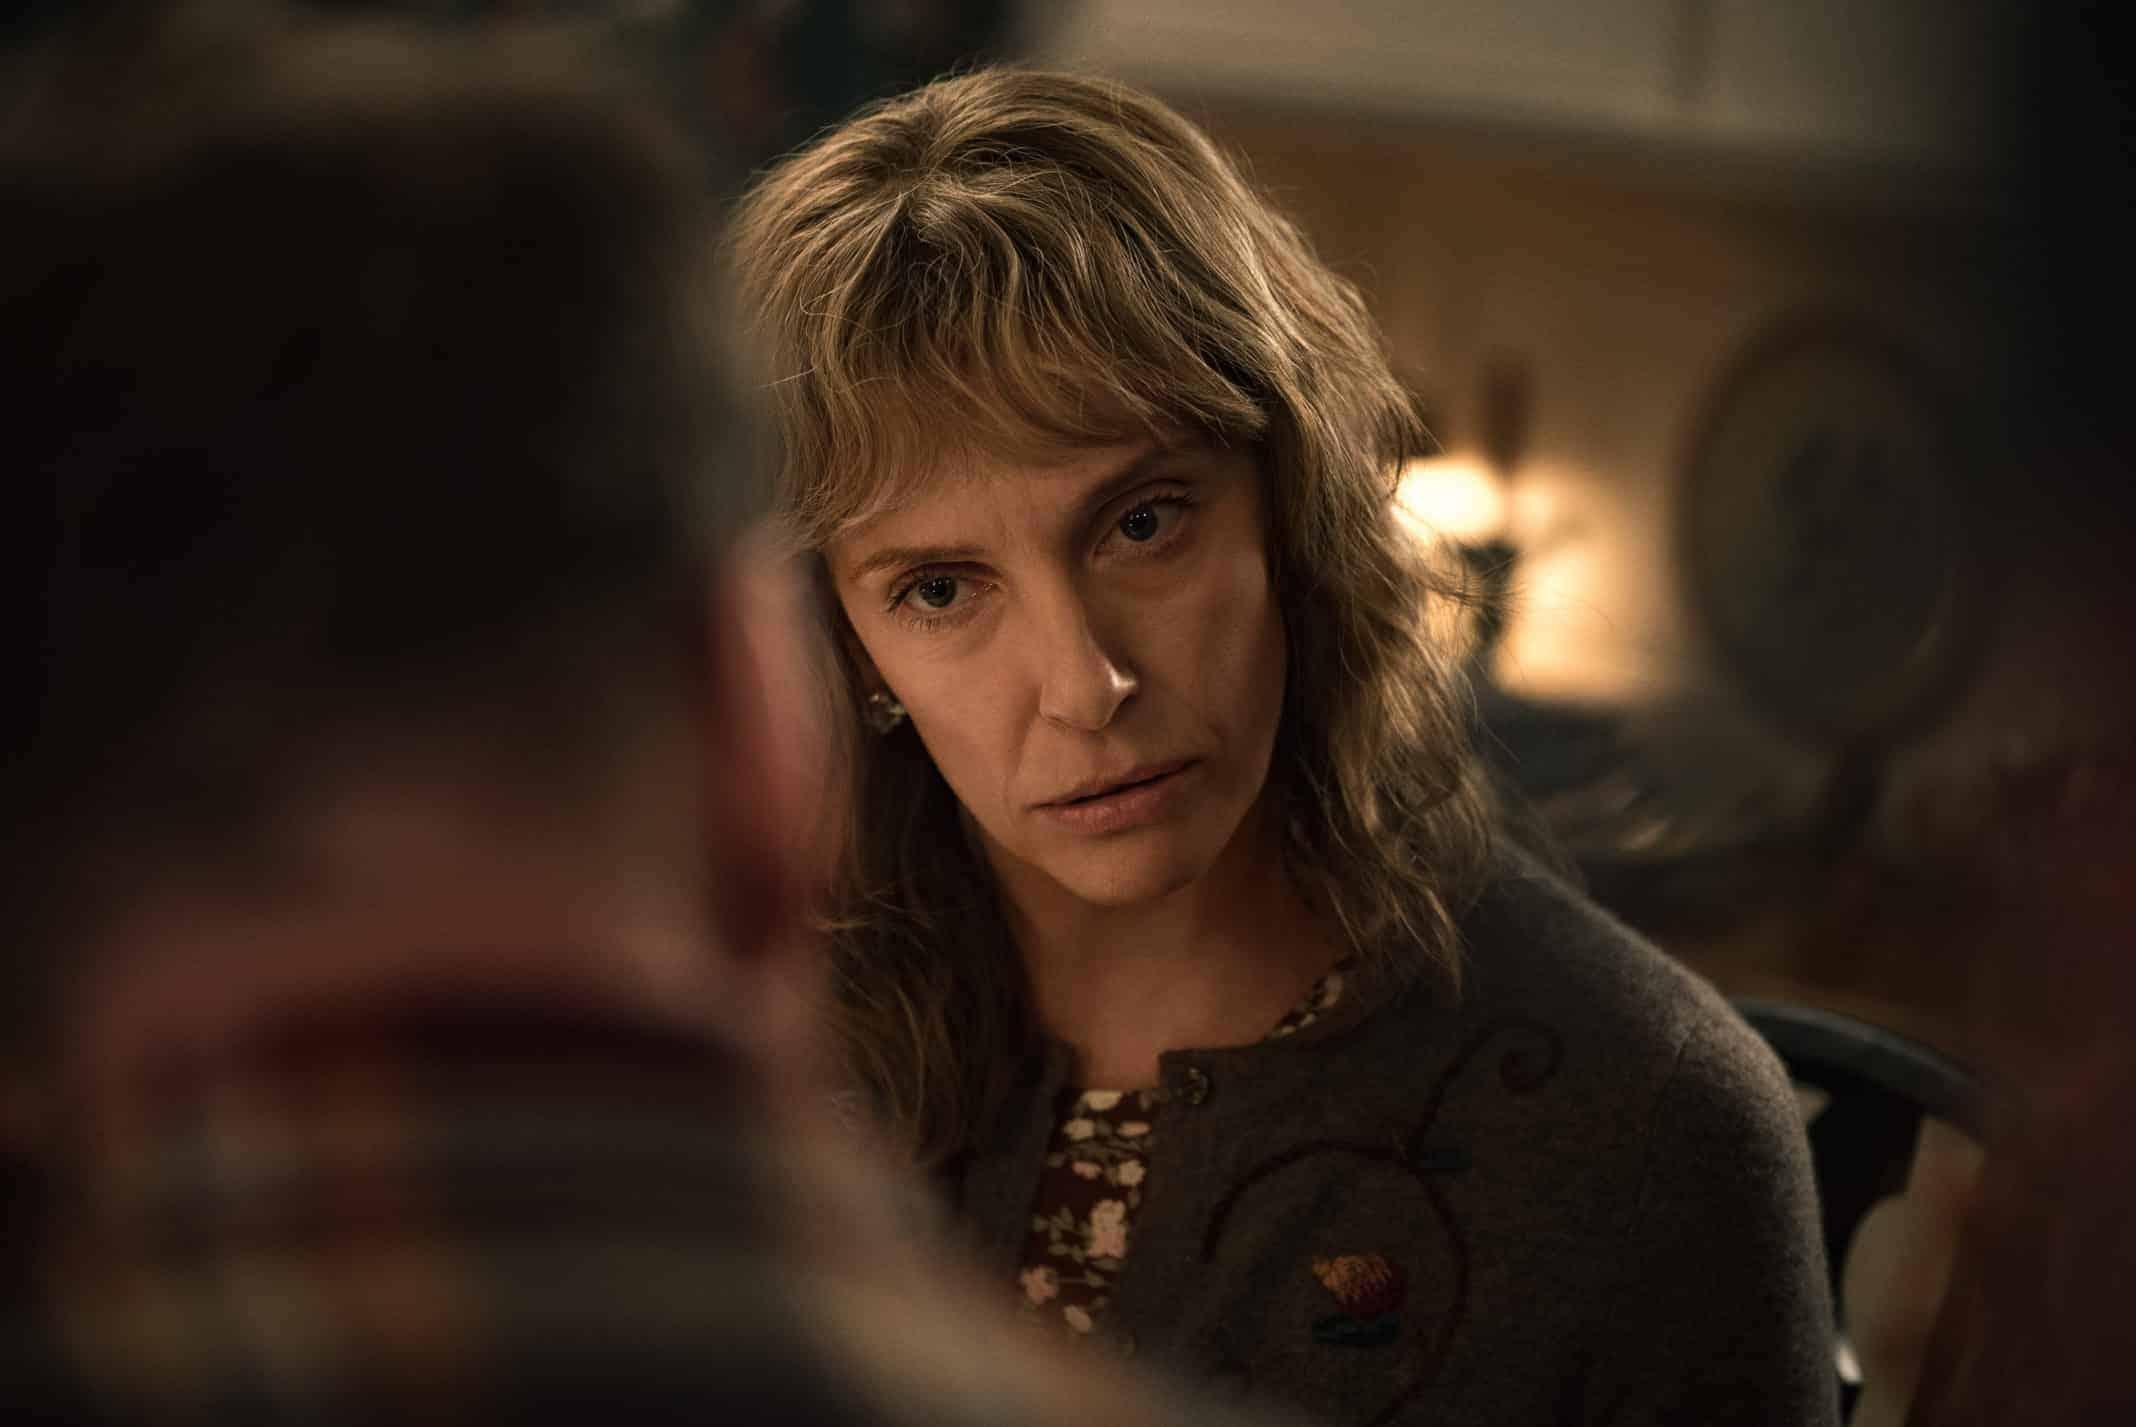 Jake's Mother (Toni Colette)